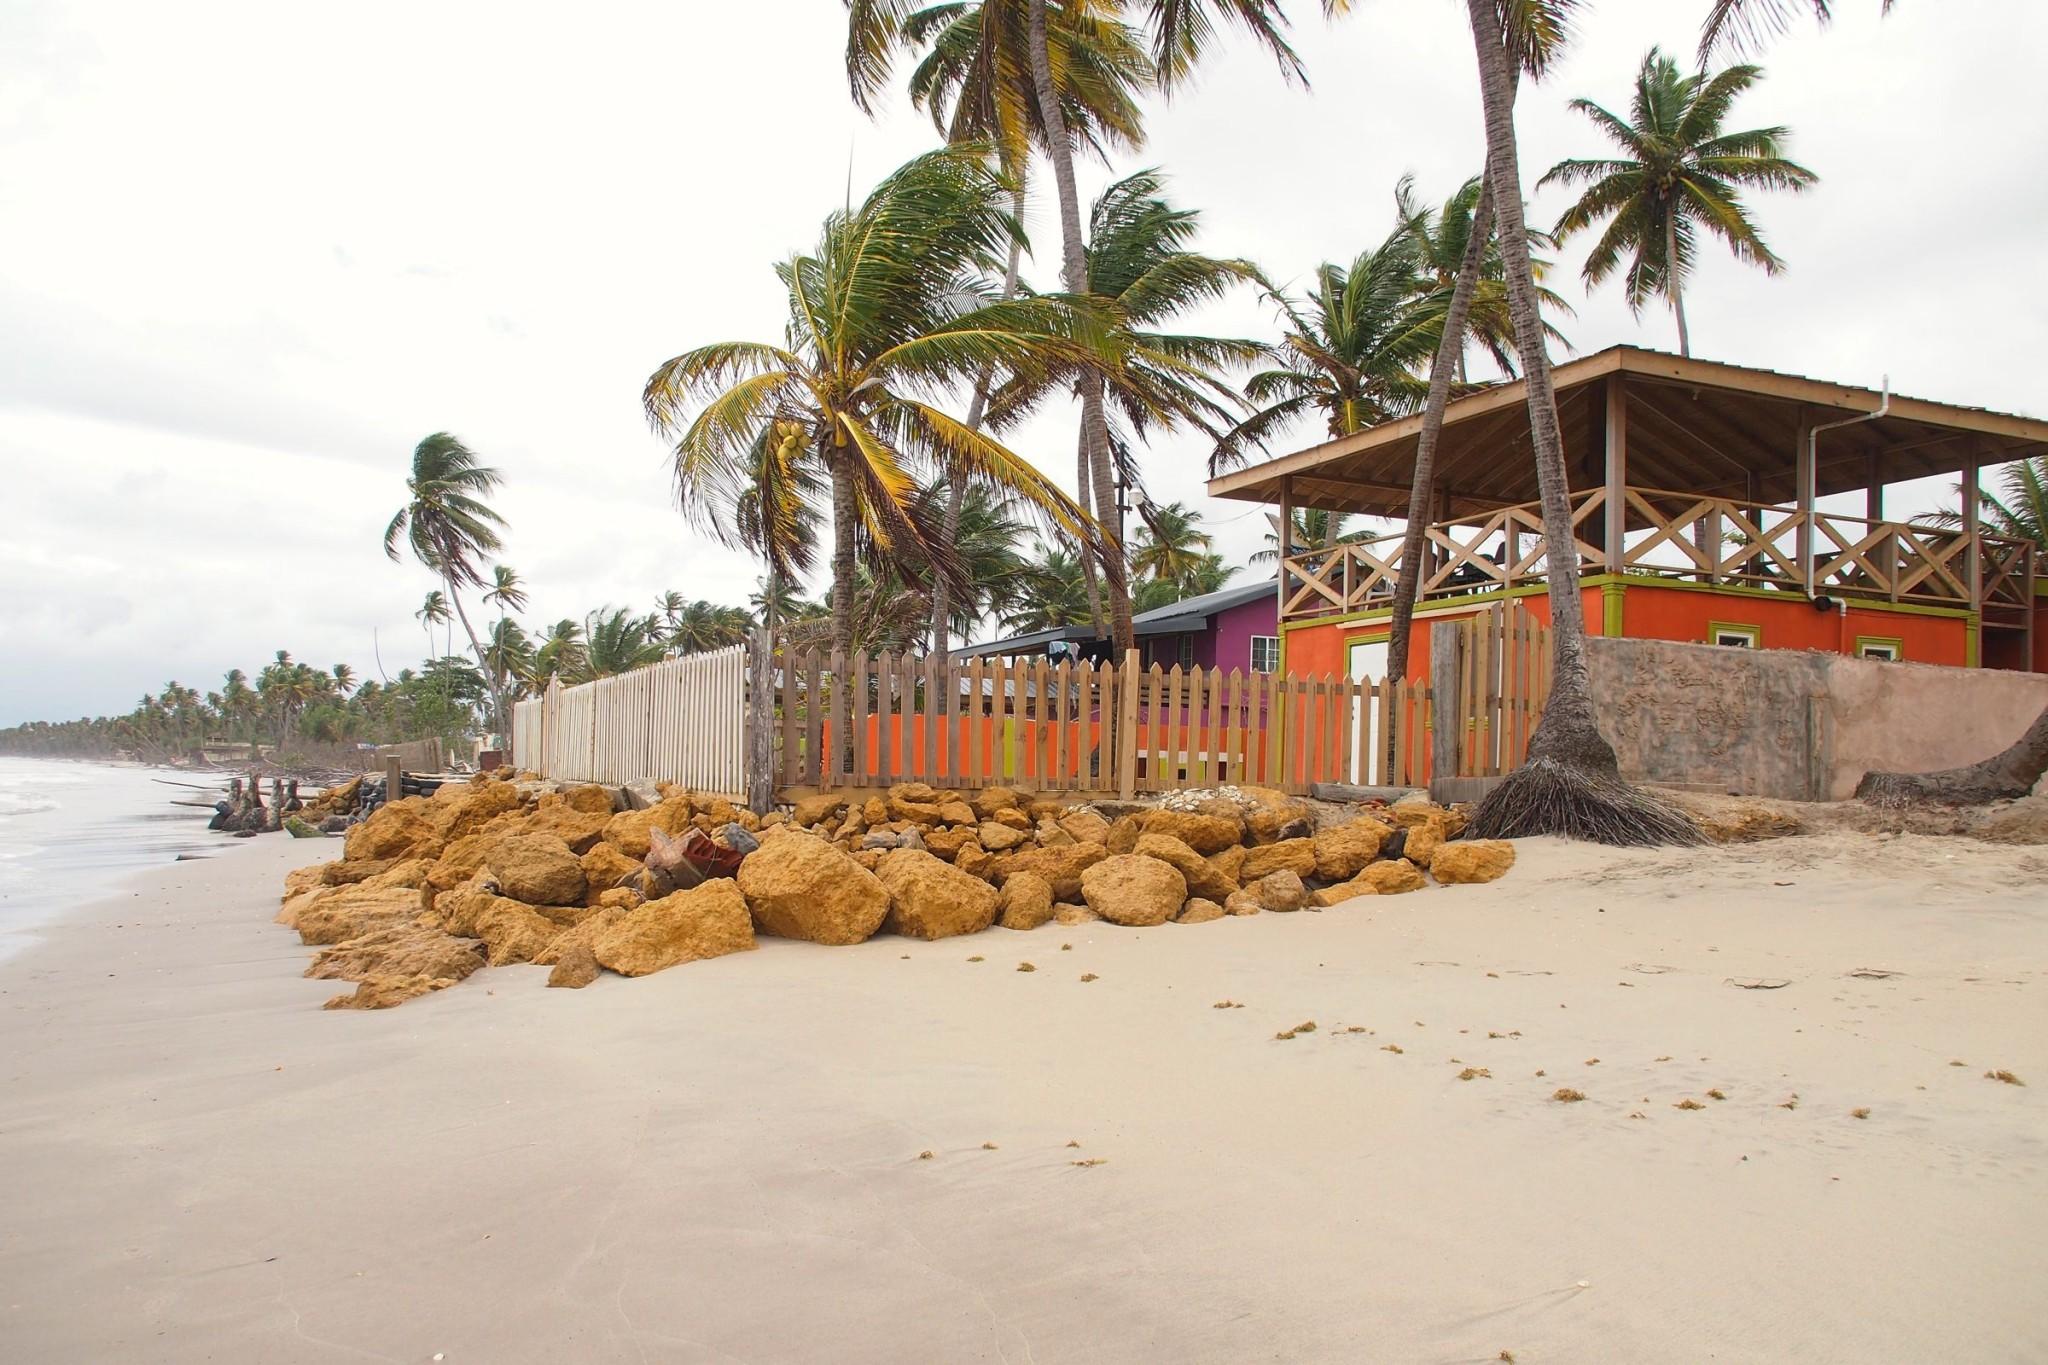 Introducing Simply Beautiful Beach House in Manzanilla, Trinidad: Uncommon Envy